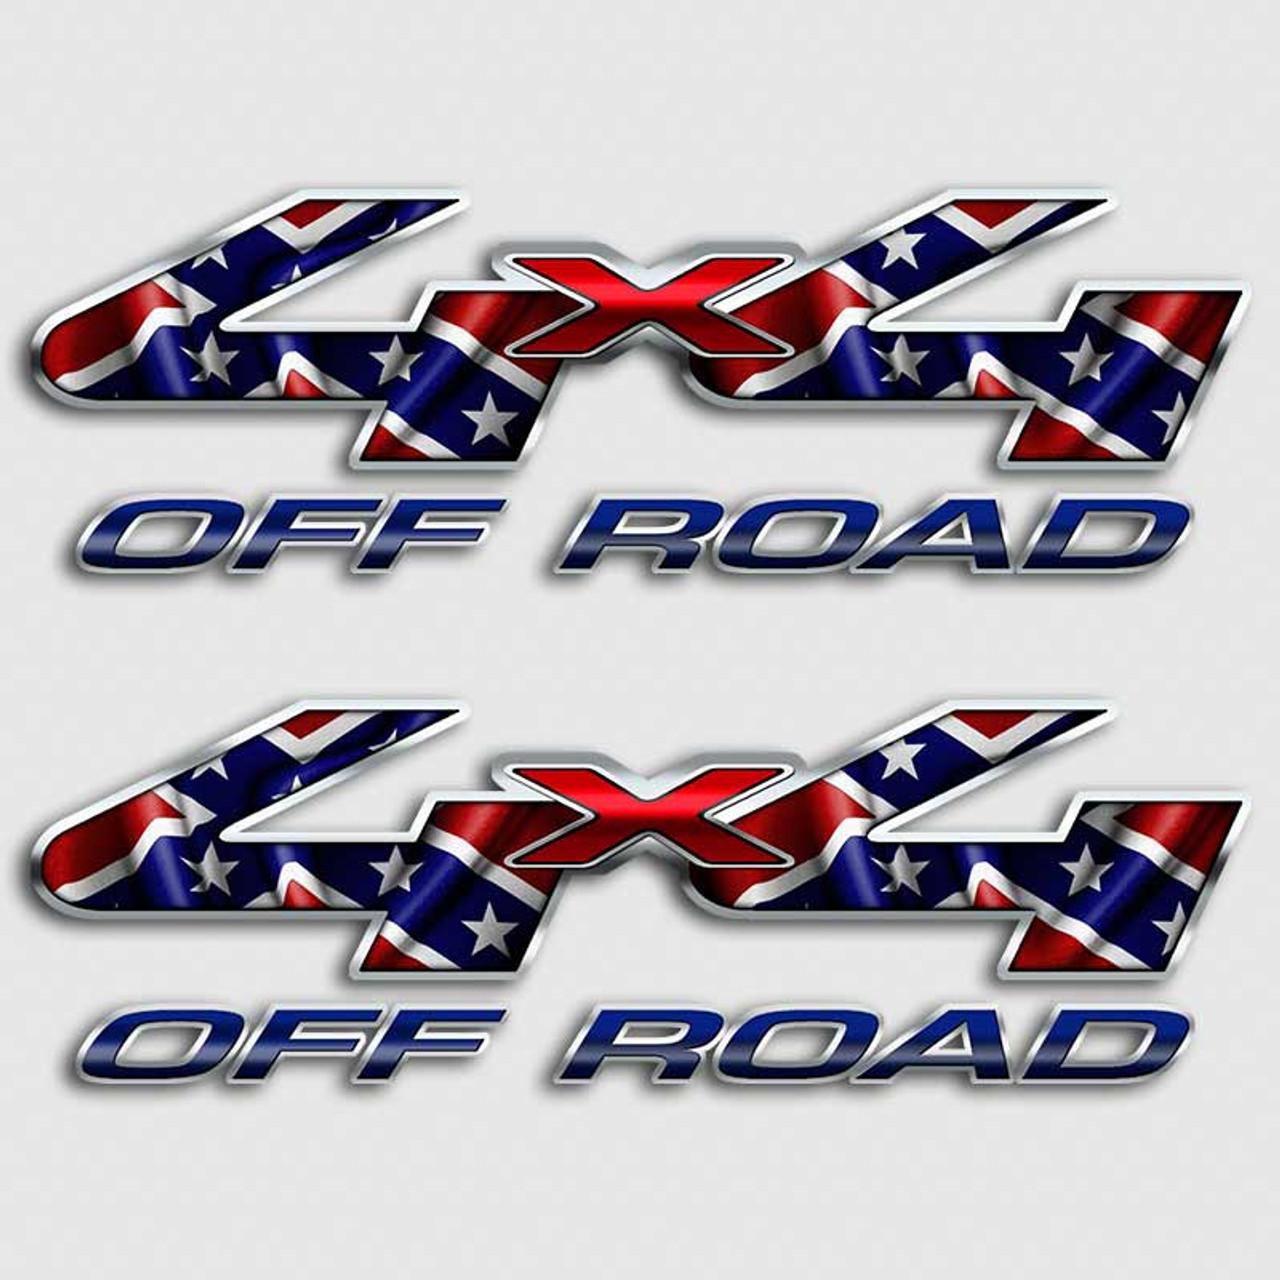 Truck X Decals Off Road Stickers Custom Wheeling Graphics - Decals for trucks